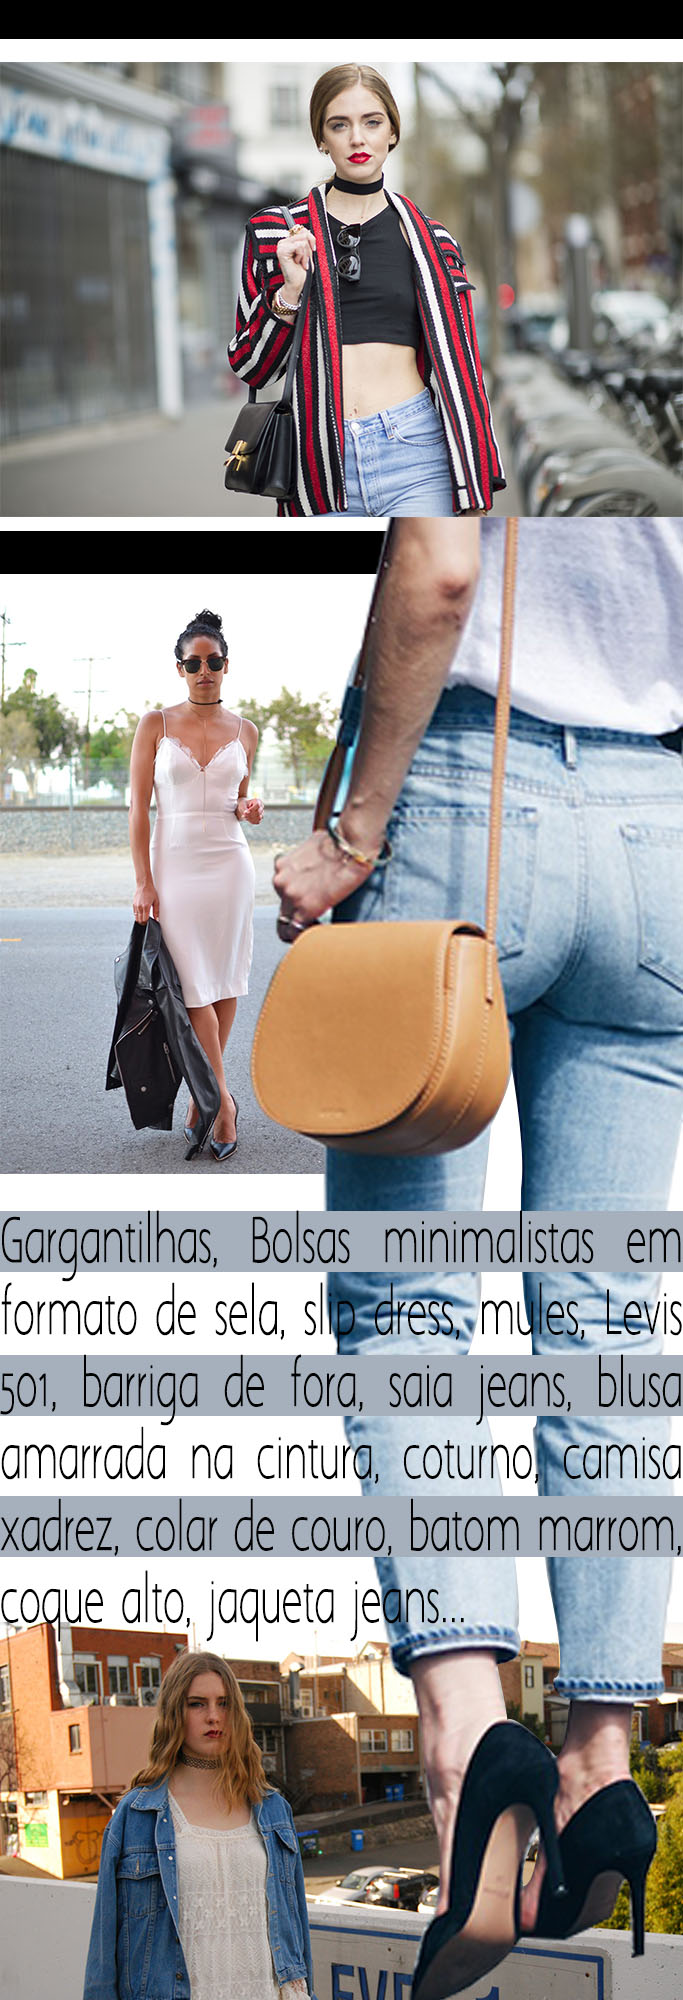 Moda - 90's Street Style - 90's Inspiration - Blog Paula Martins 2